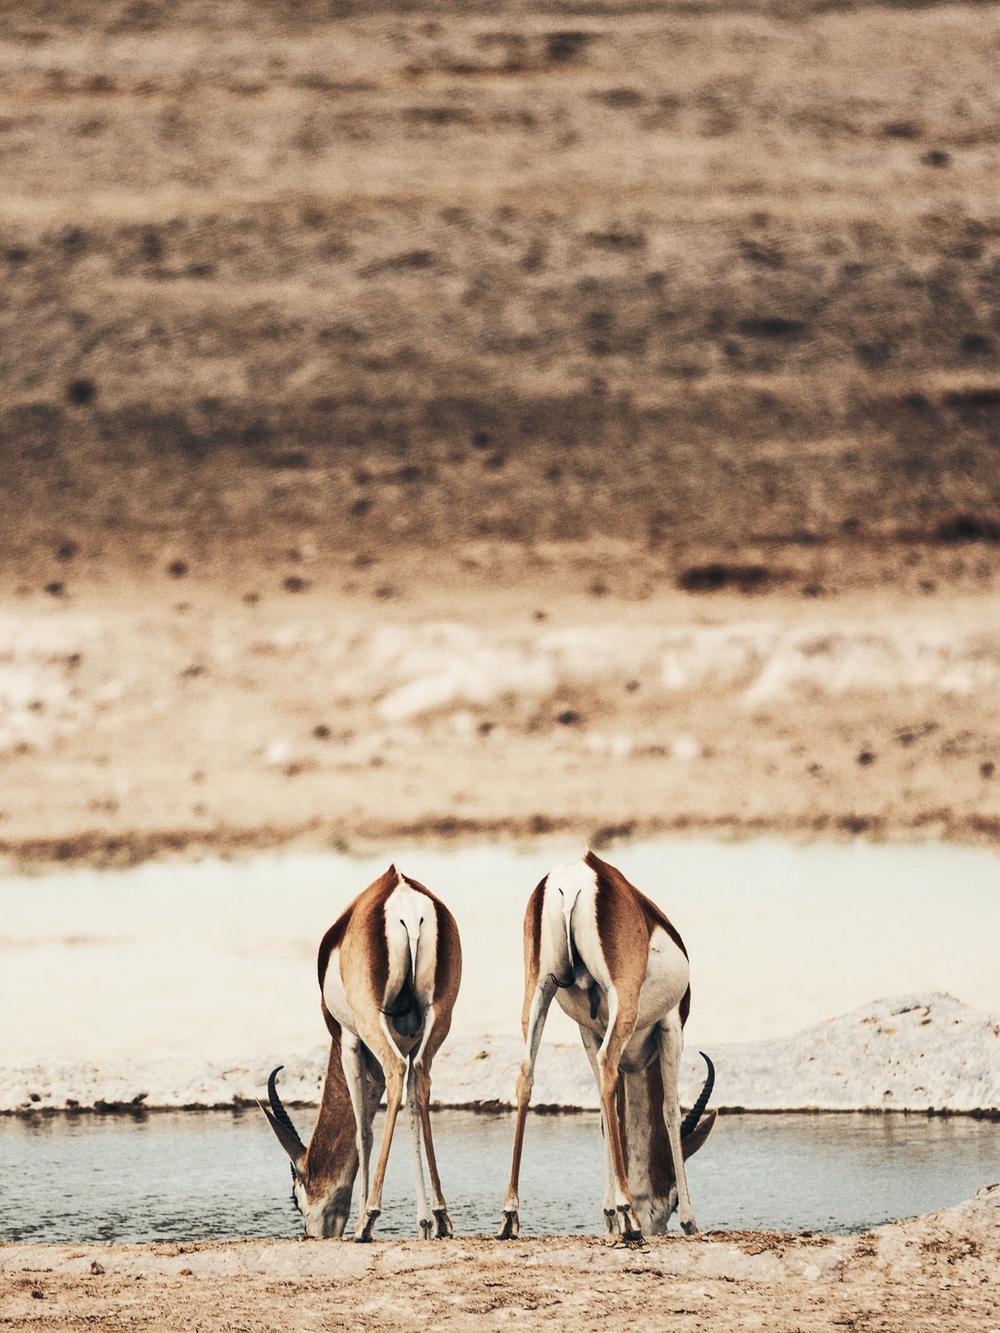 CallieGiovanna_Africa_Namibia_EtoshaNationalPark_20150101_01690.jpg